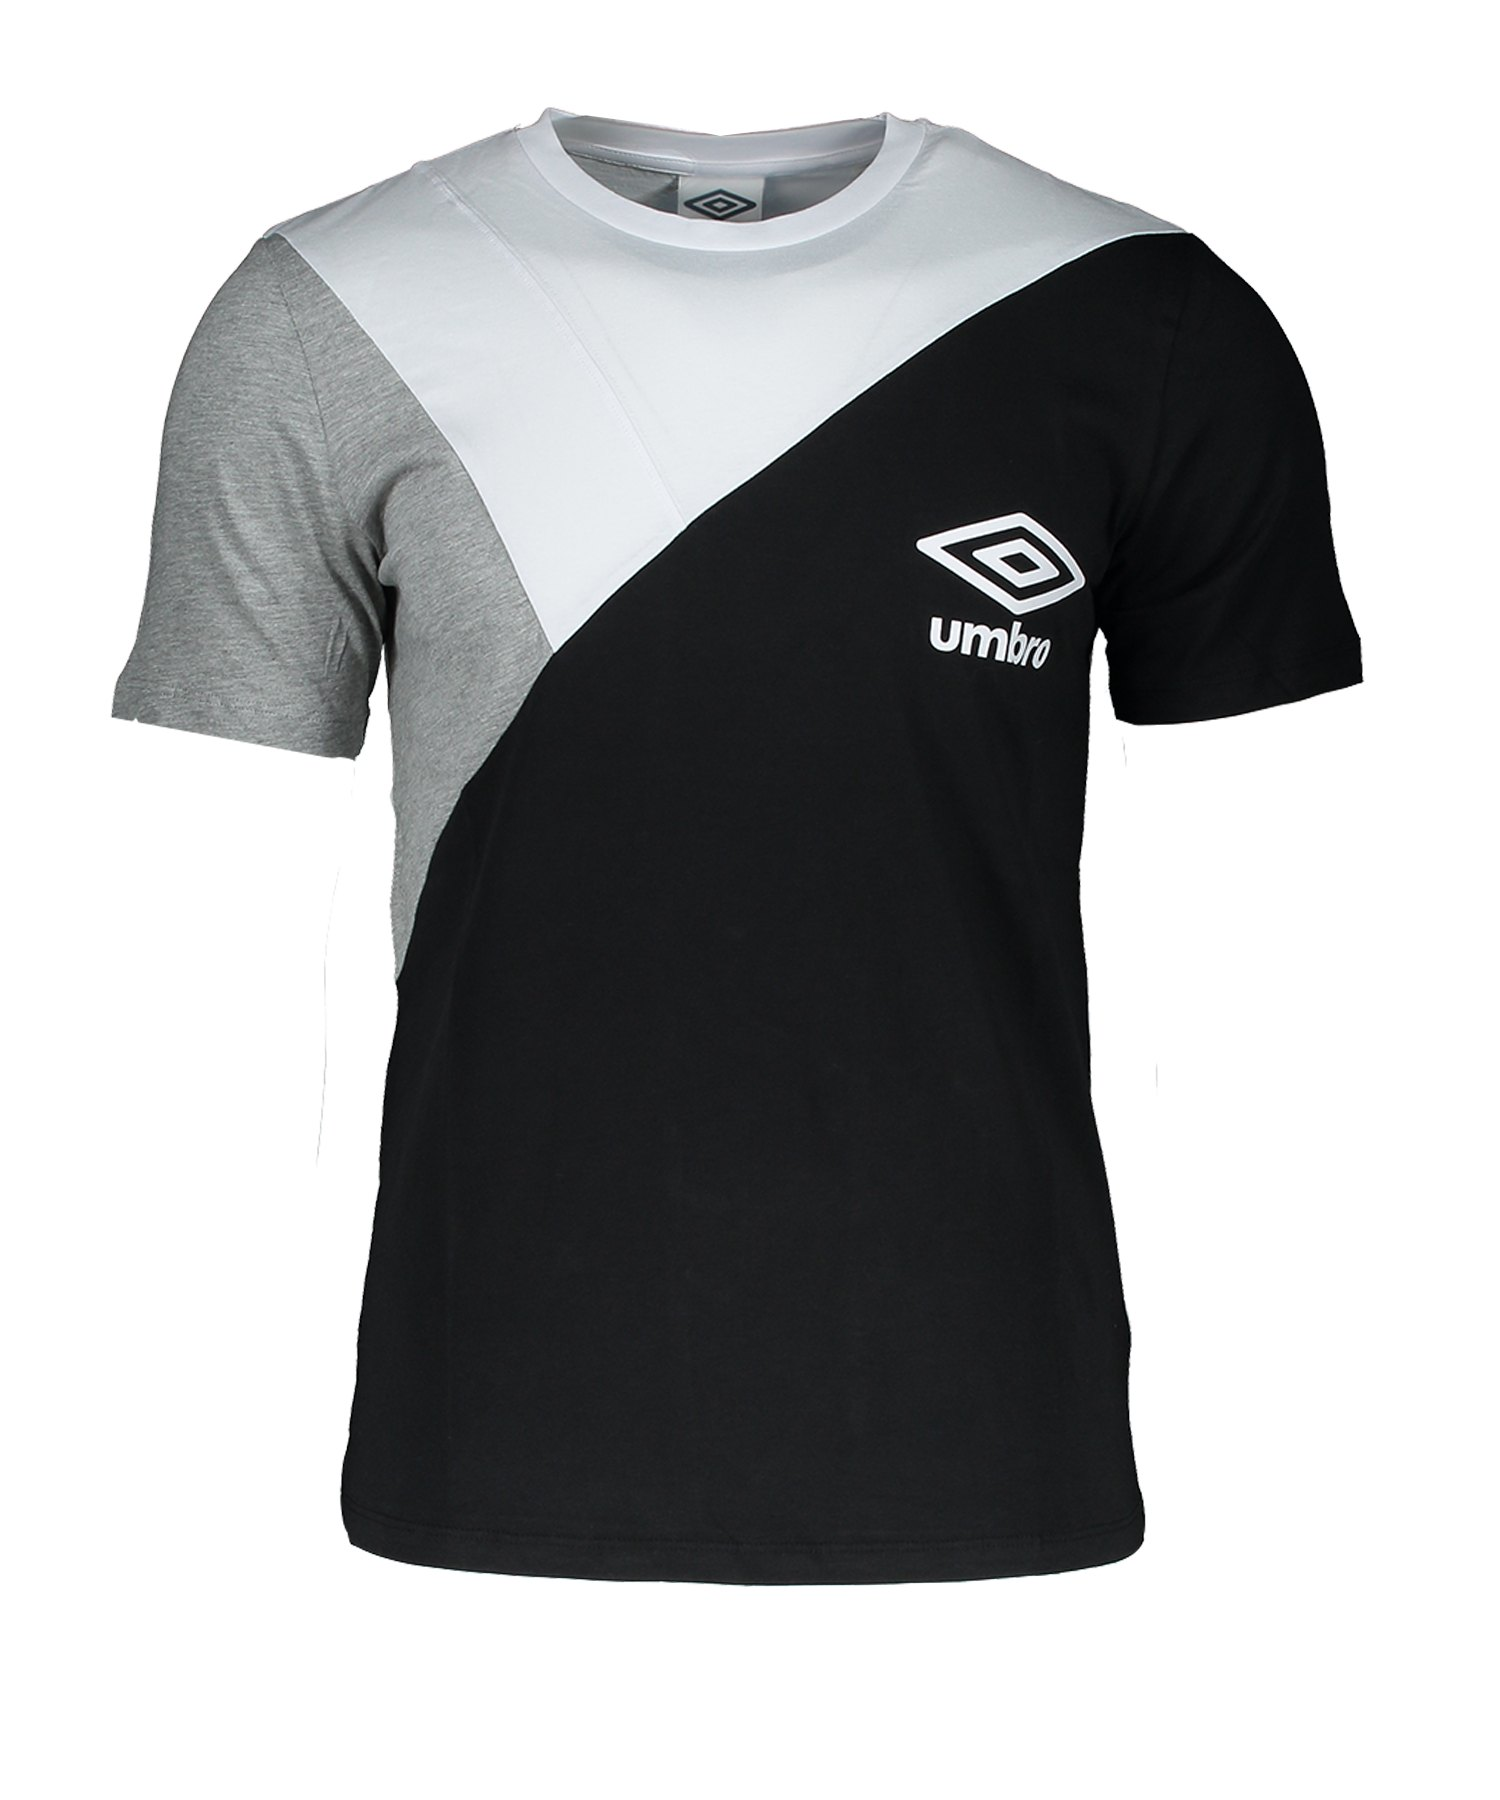 Umbro Colourblock T-Shirt Schwarz FHF7 - Schwarz